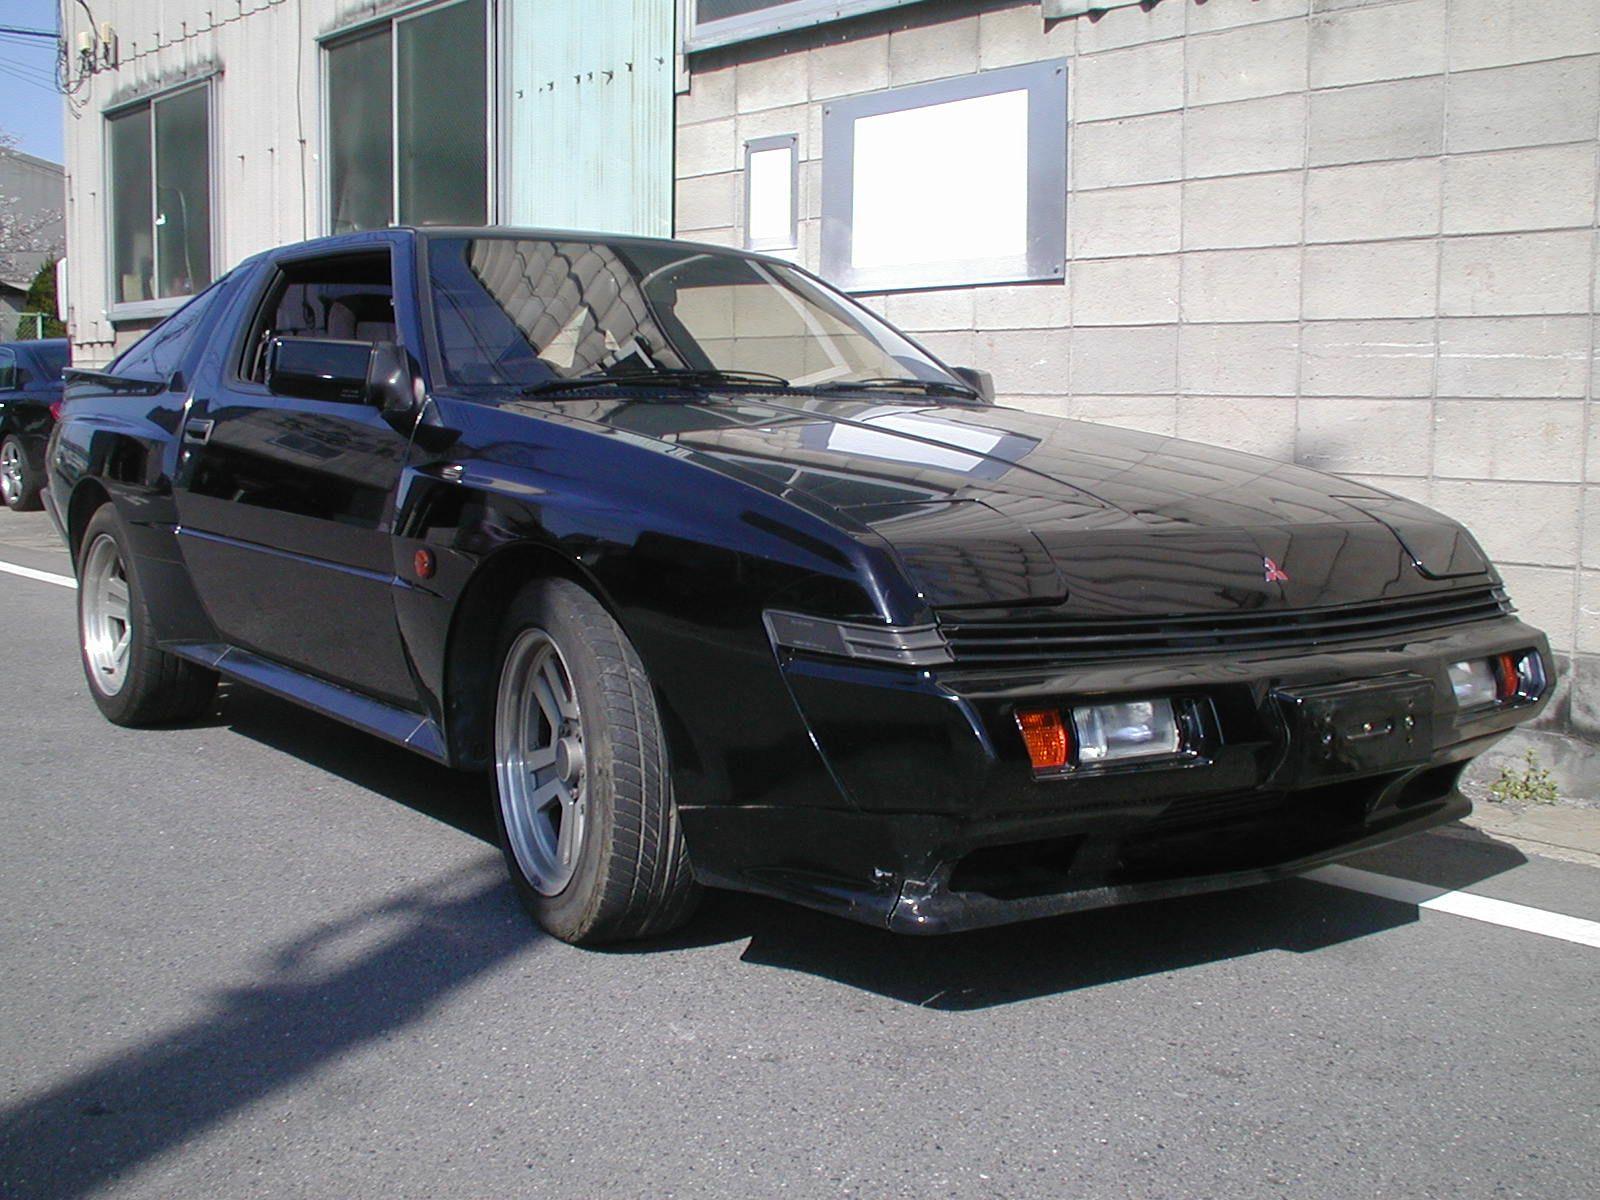 1986 Dodge Conquest Tsi Mitsubishi Starion Turbo Just Buy It